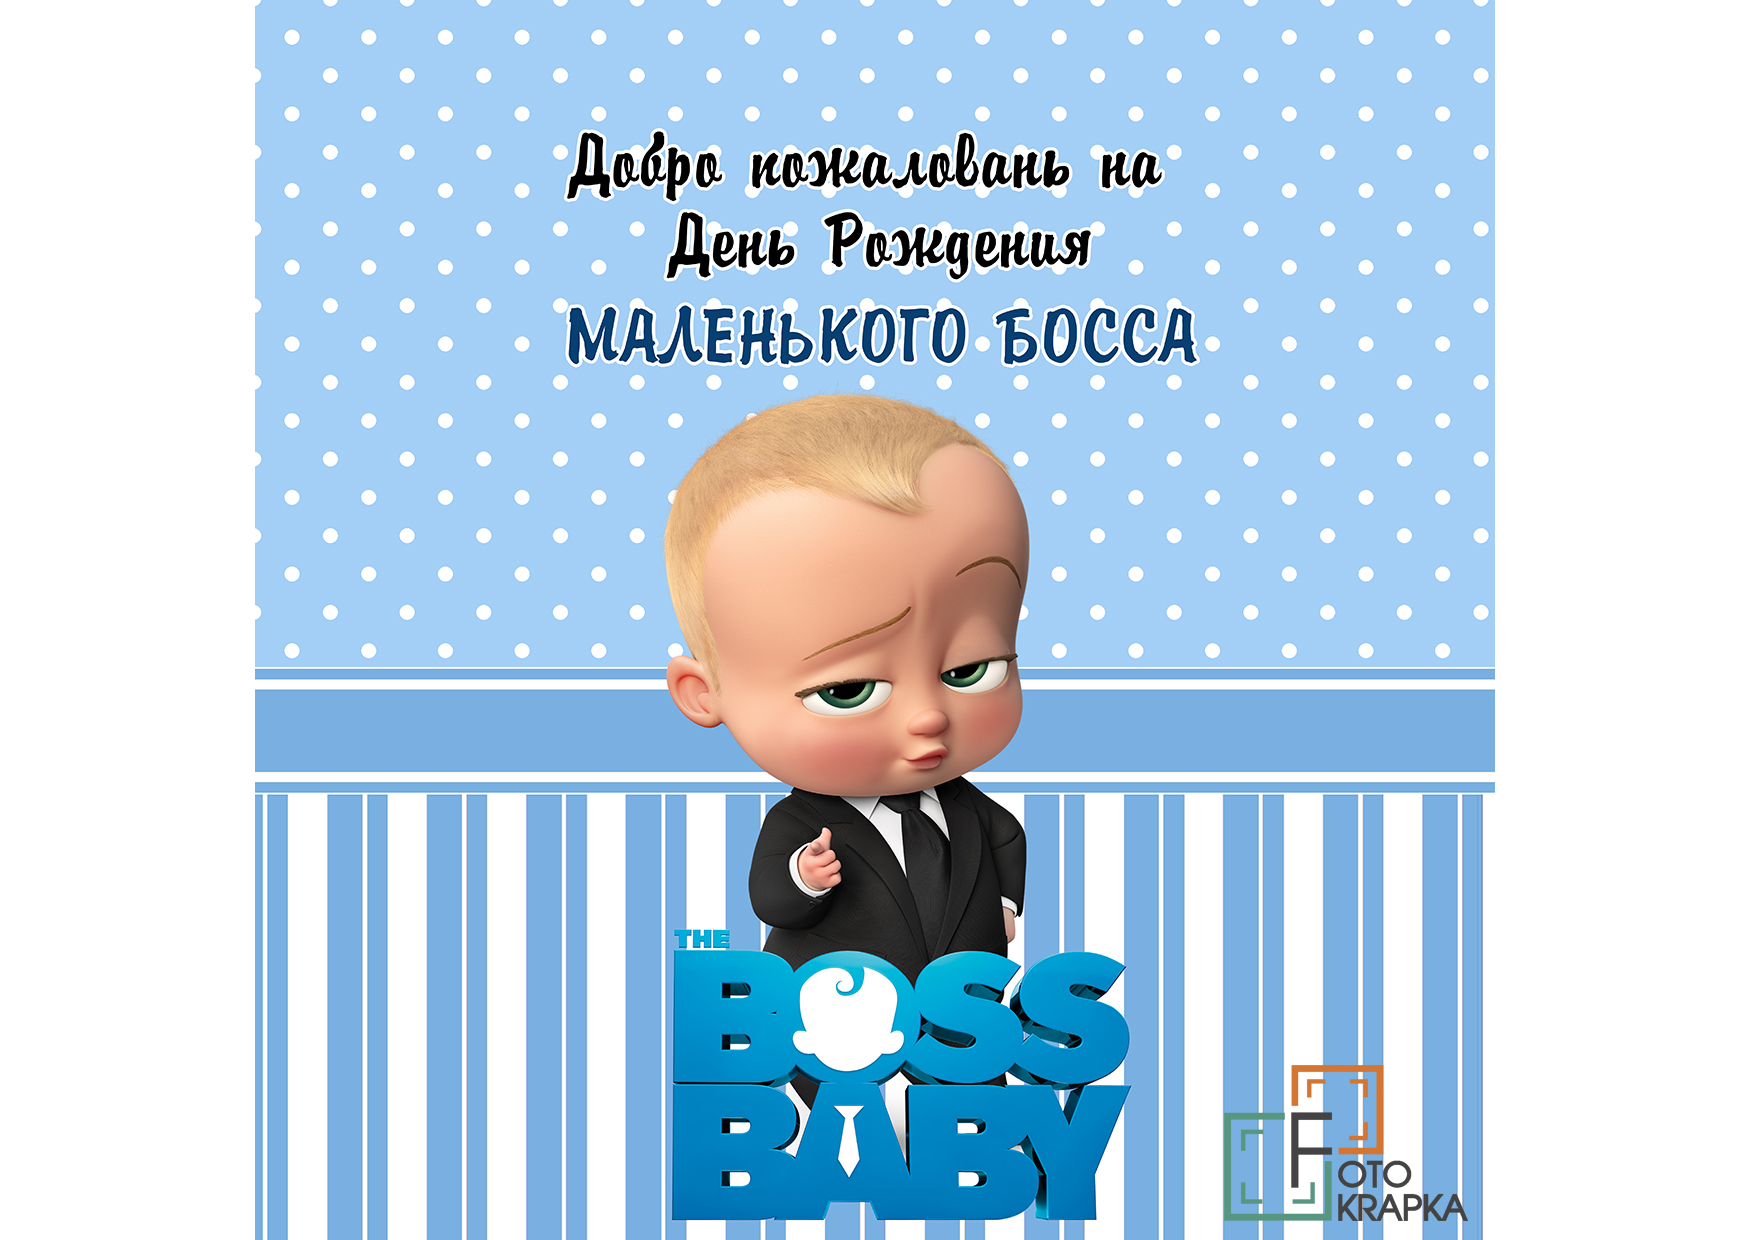 Фотозона босс молокосос Дніпро